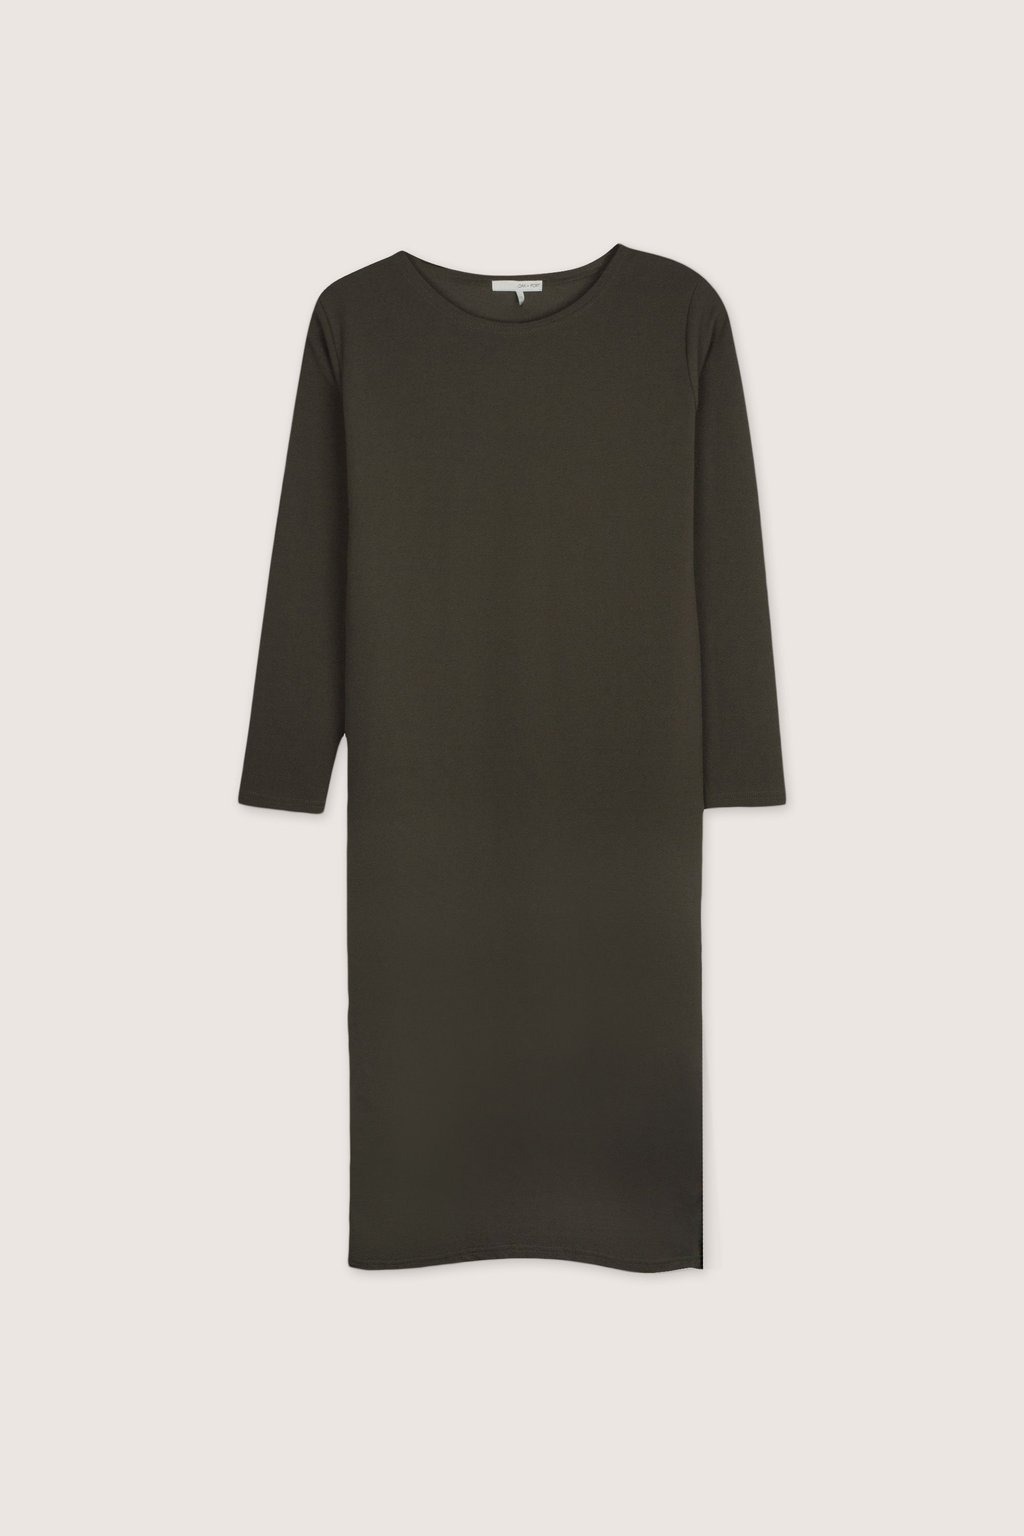 Dress H256 Olive 5